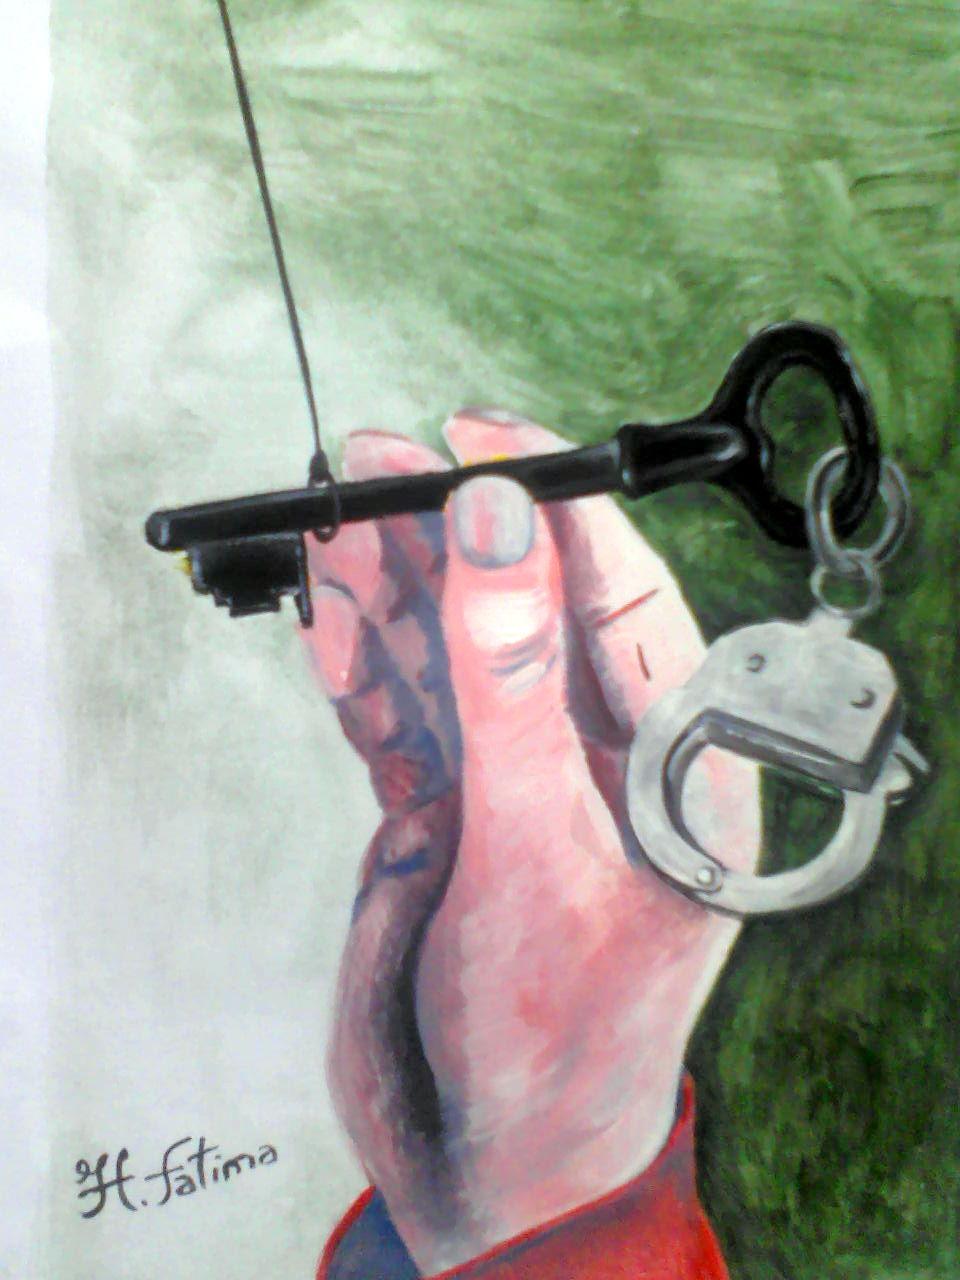 The black key of mystery